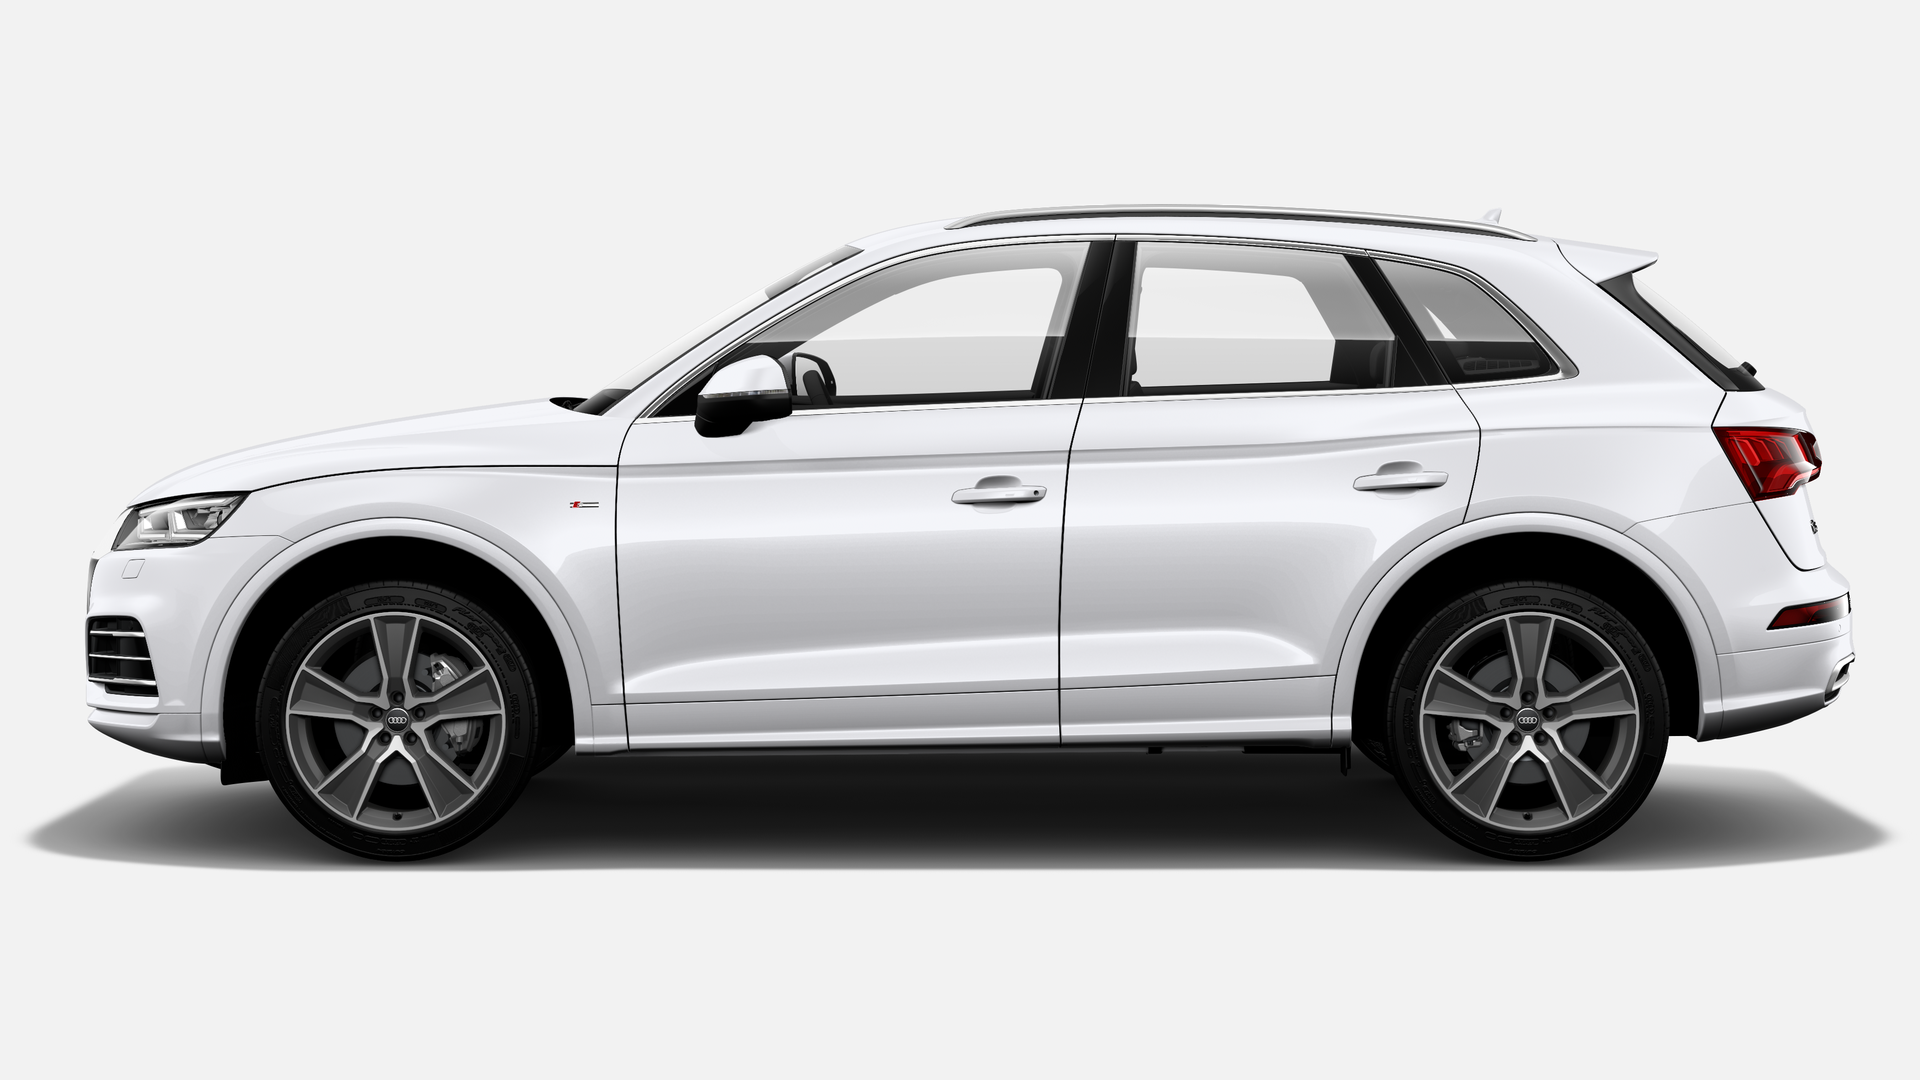 Audi Q5 2.0 TDI Black Line edition quattro S-Tronic 140 kW (190 CV)